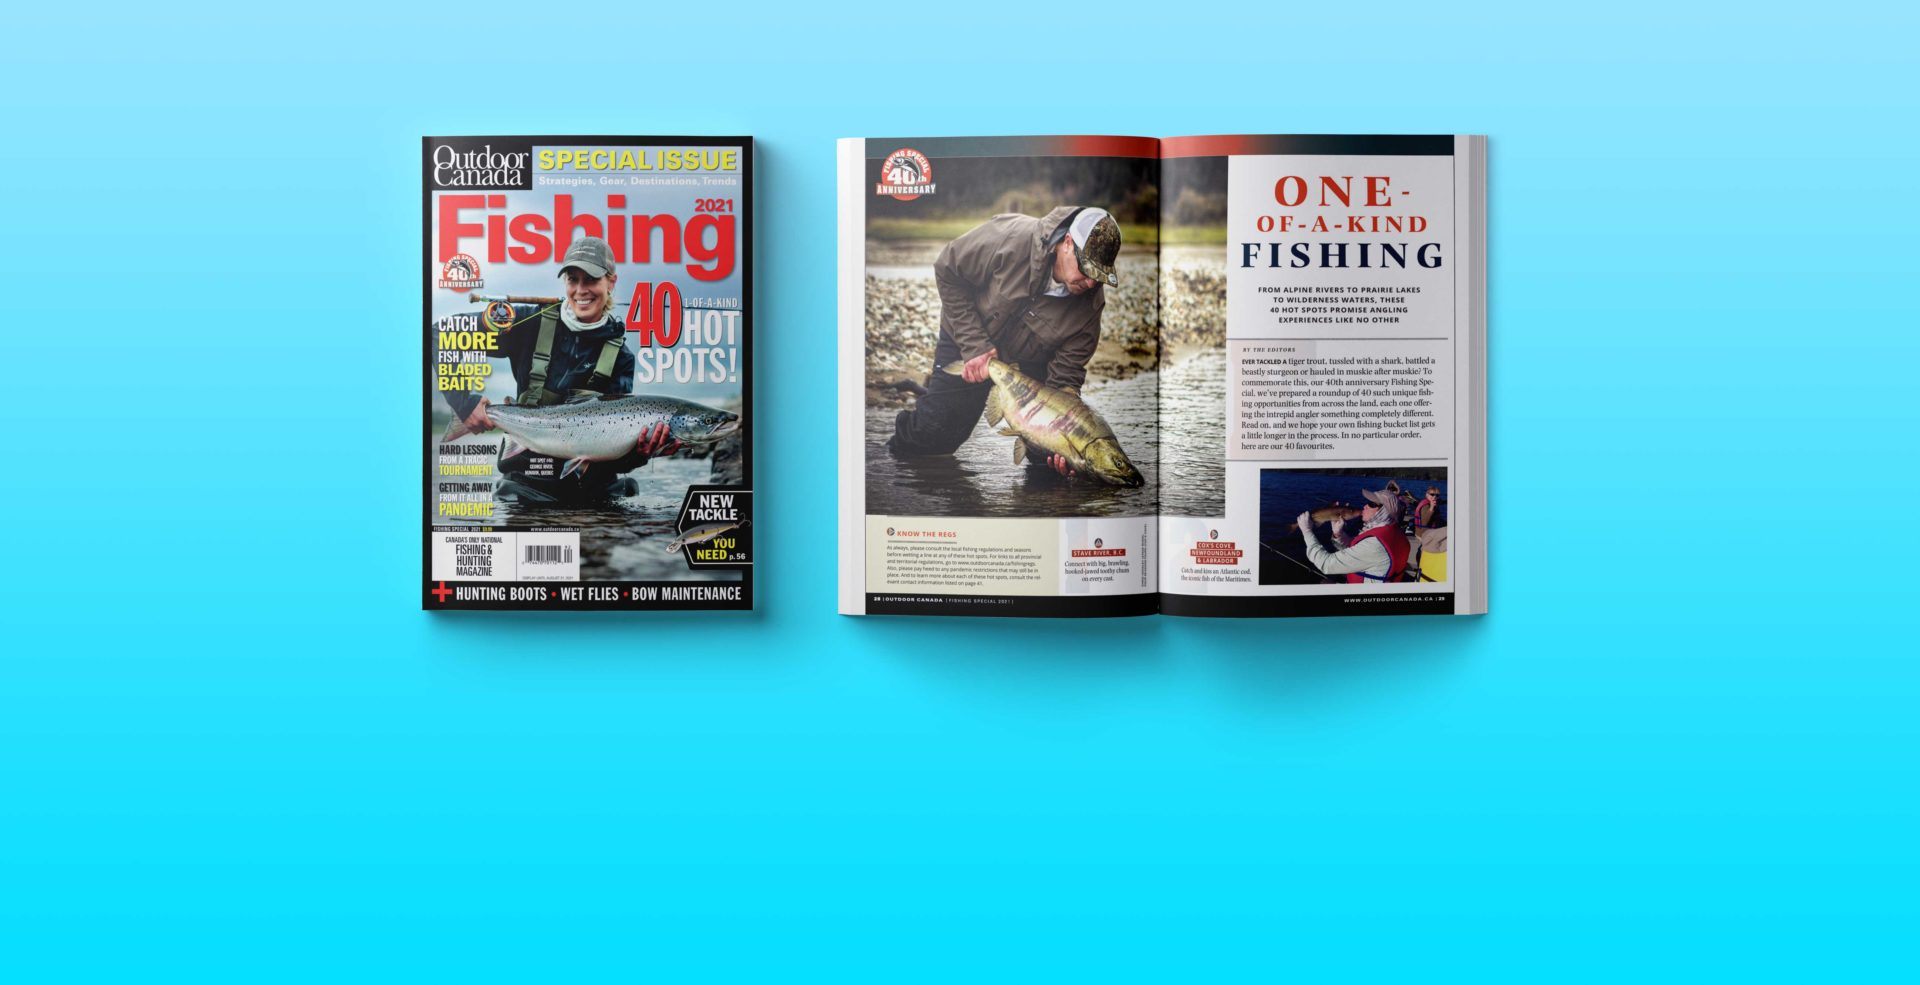 Outdoor Canada magazine.